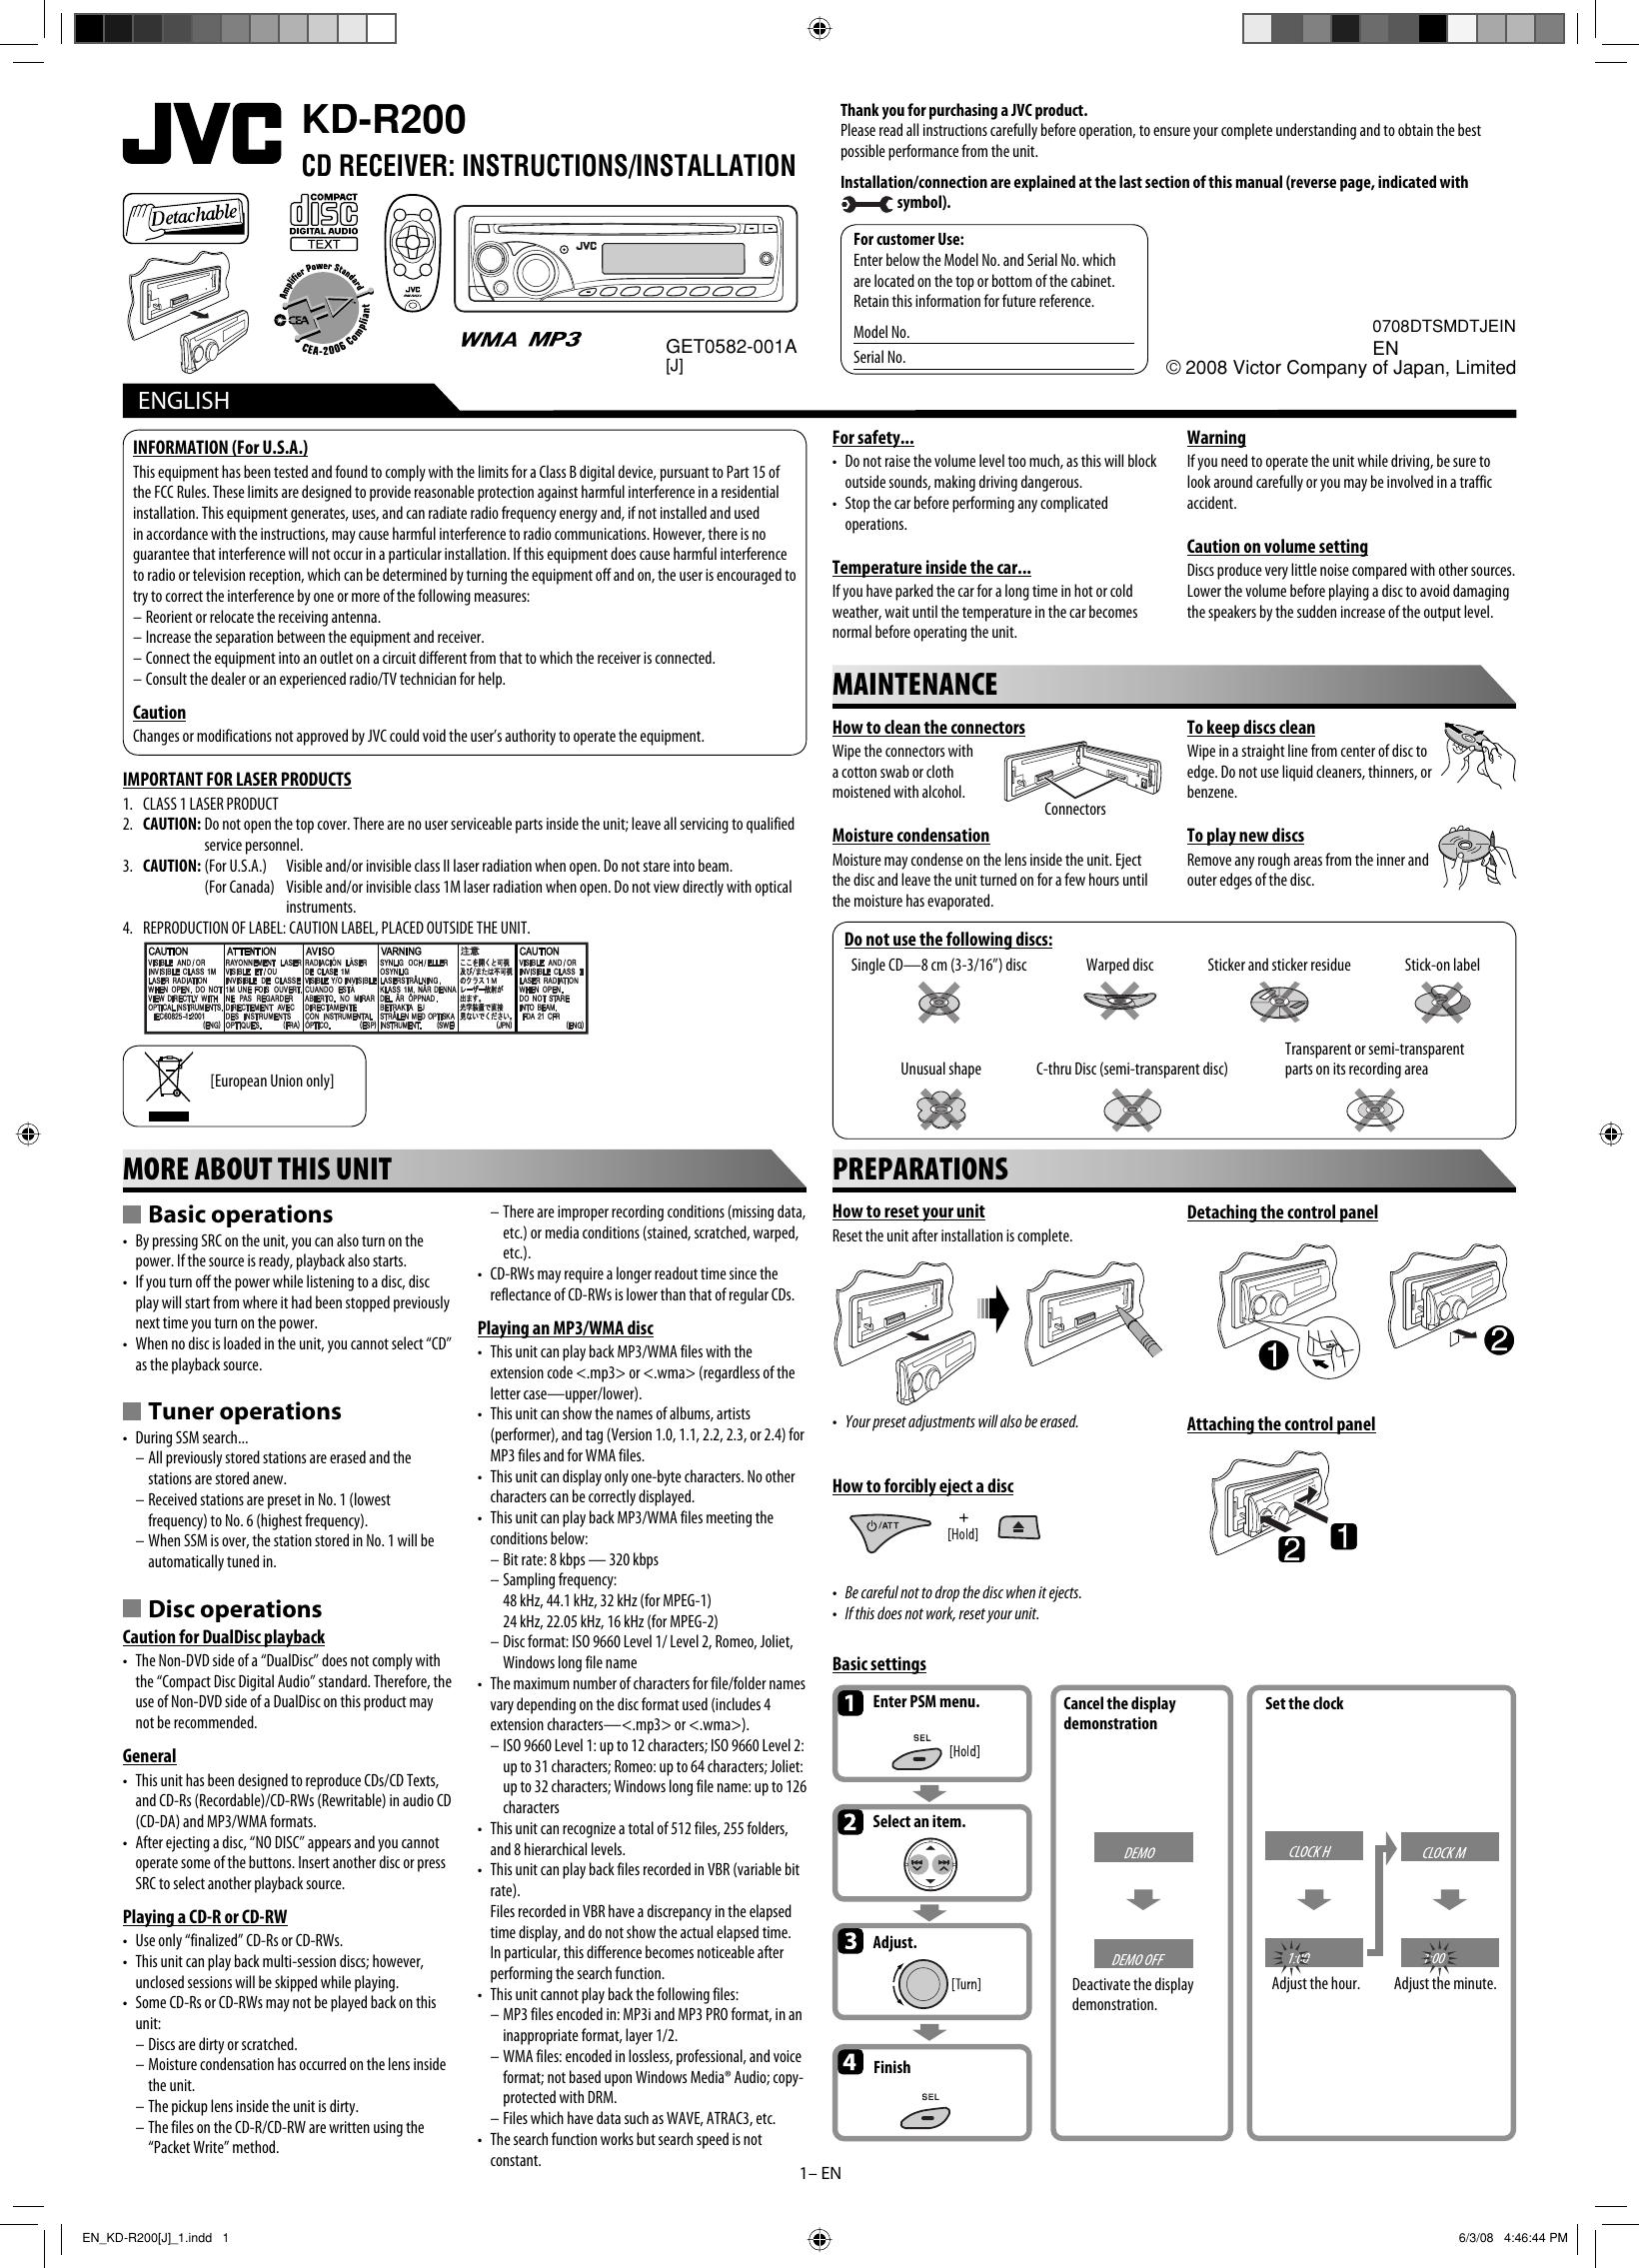 Jvc Kd R200 Wiring Diagram Page 2 And Schematics R540 Instruction Manual En J 1 Indd Rh Usermanual Wiki